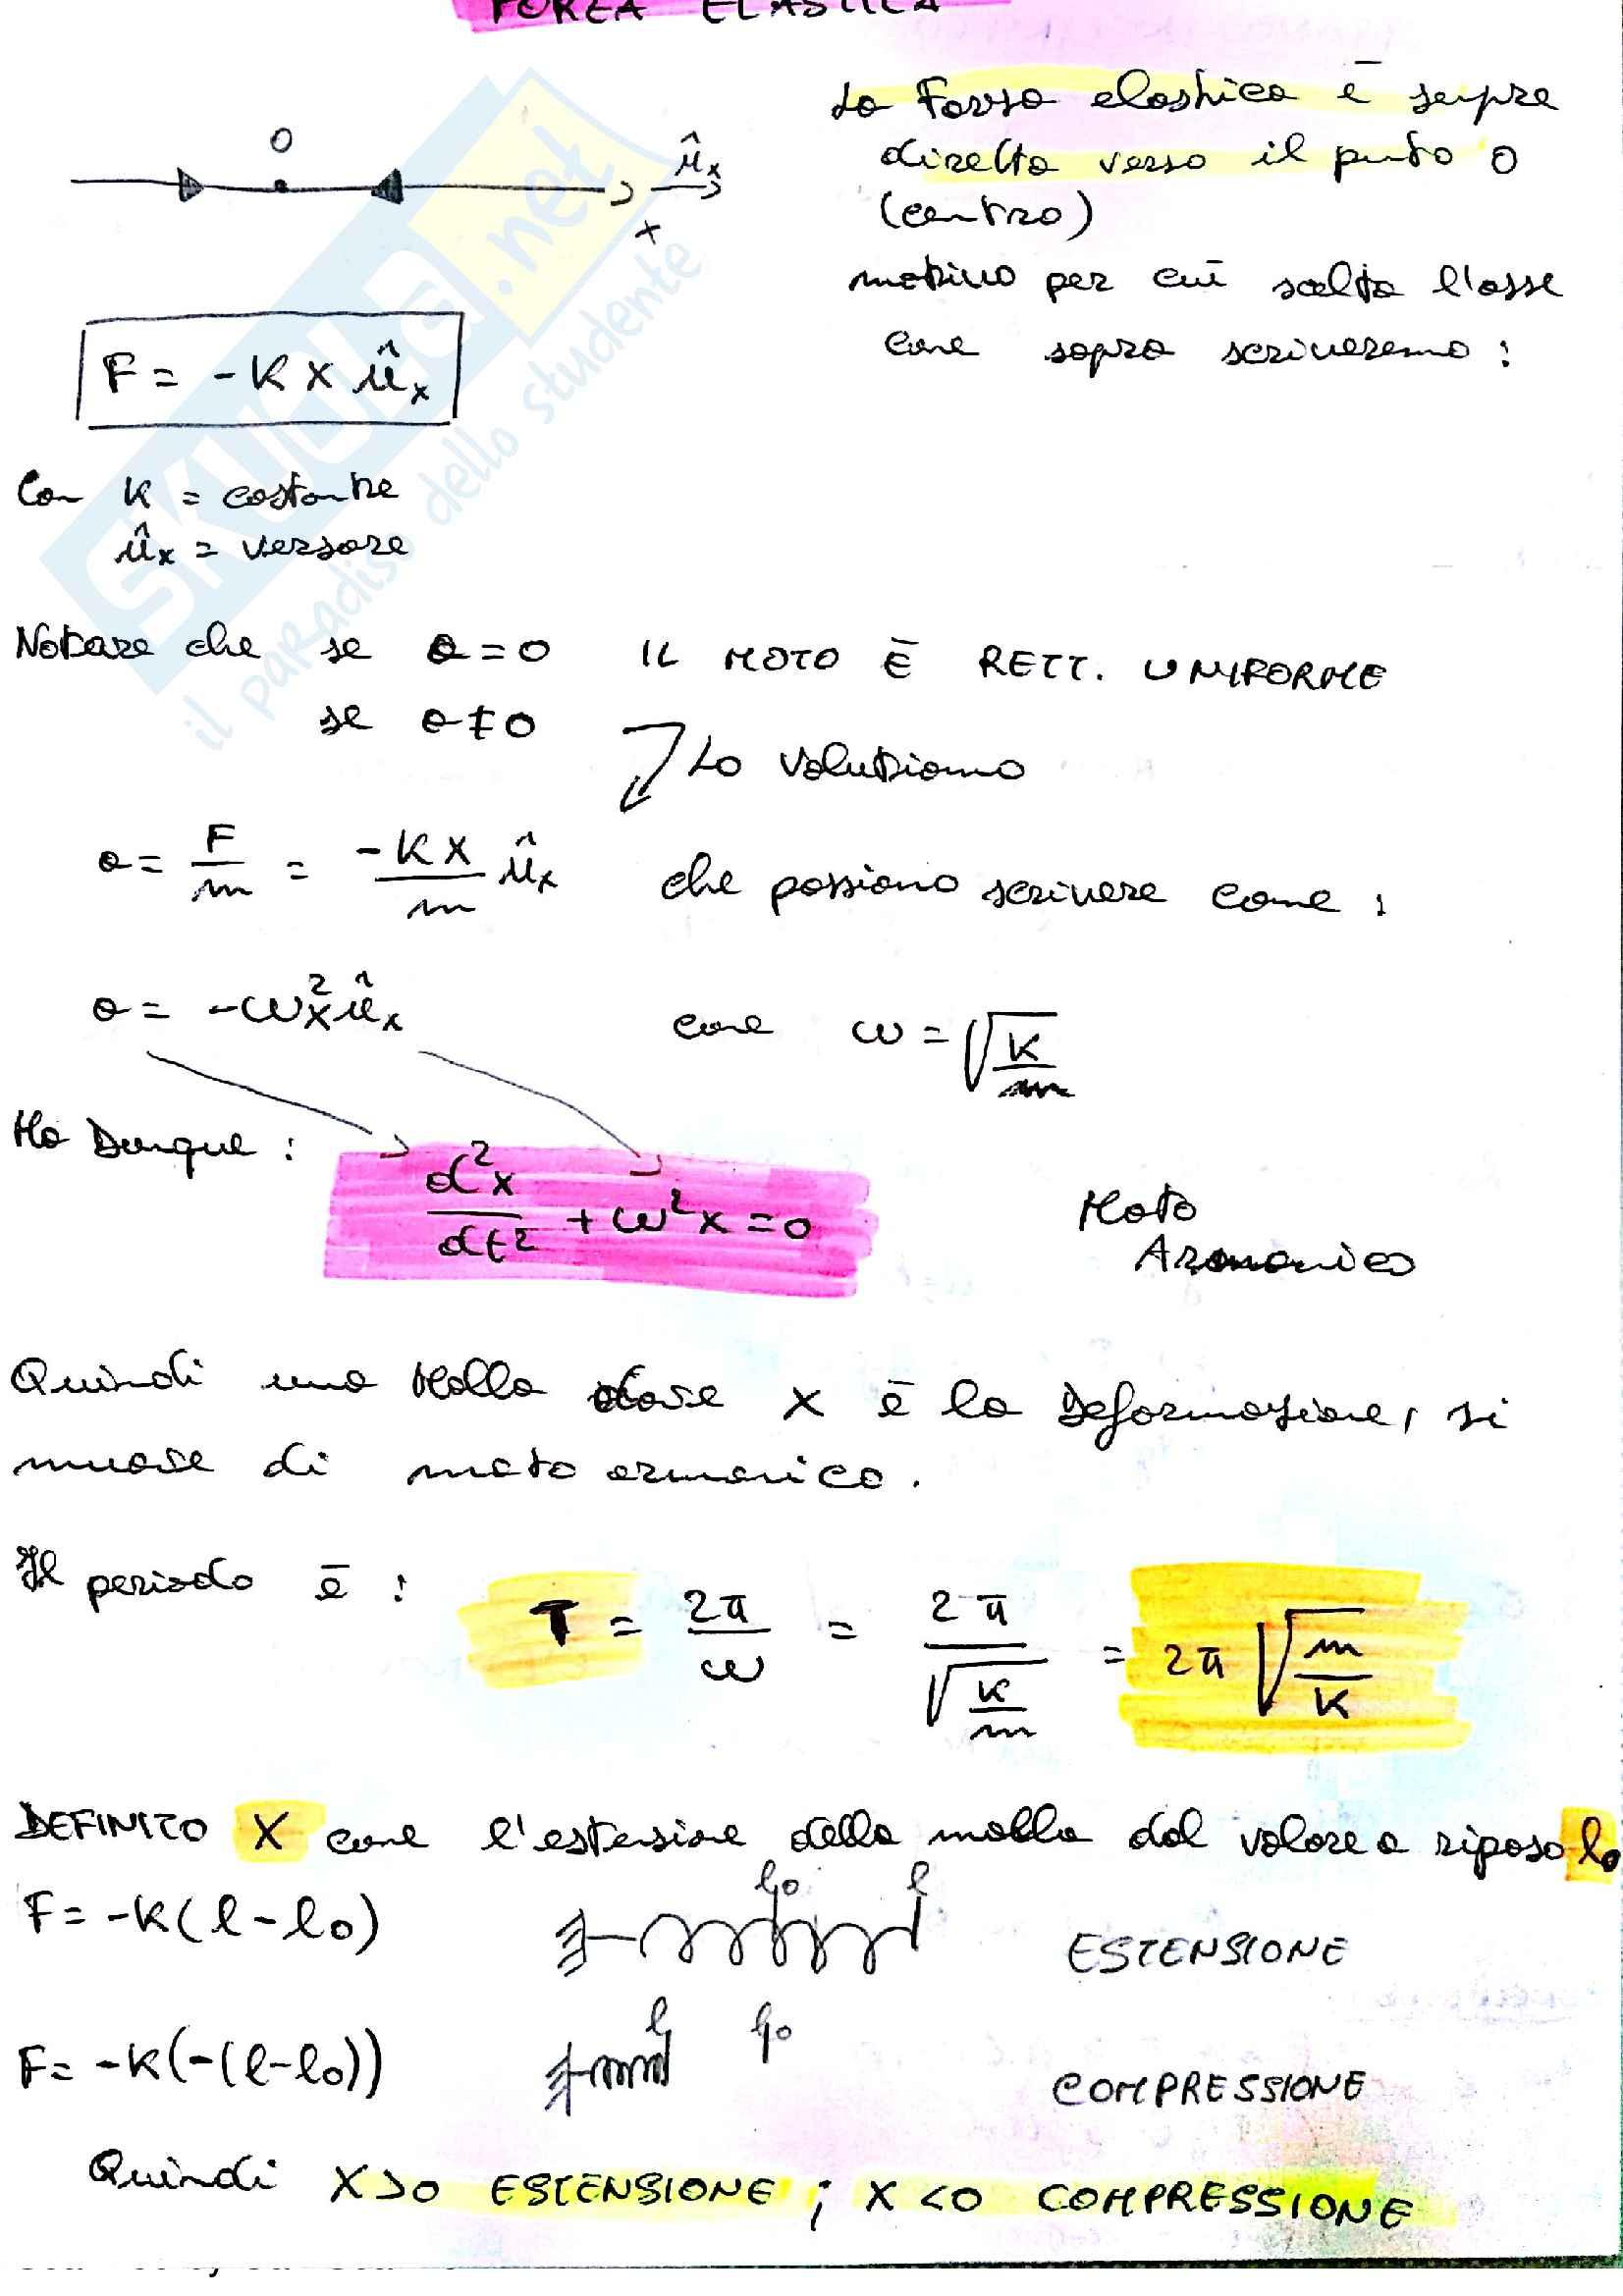 Fisica 1 , Ghigo Gianluca, Appunti + QUIZ Esame + Temi Esame (Polito) Pag. 31